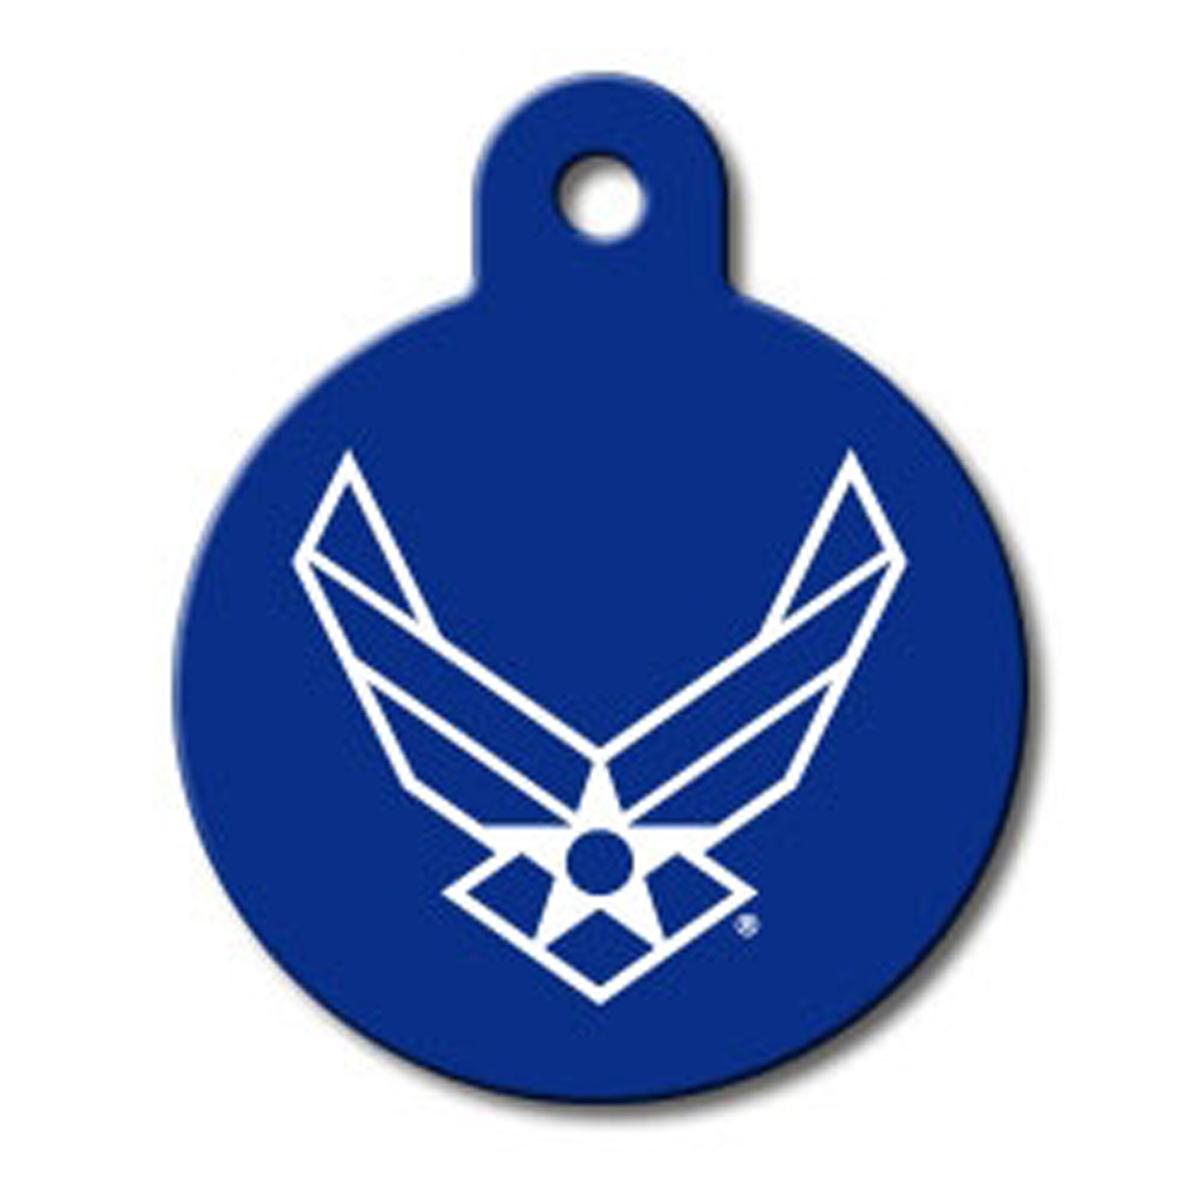 U.S. Air Force Engravable Pet I.D. Tag - Large Circle